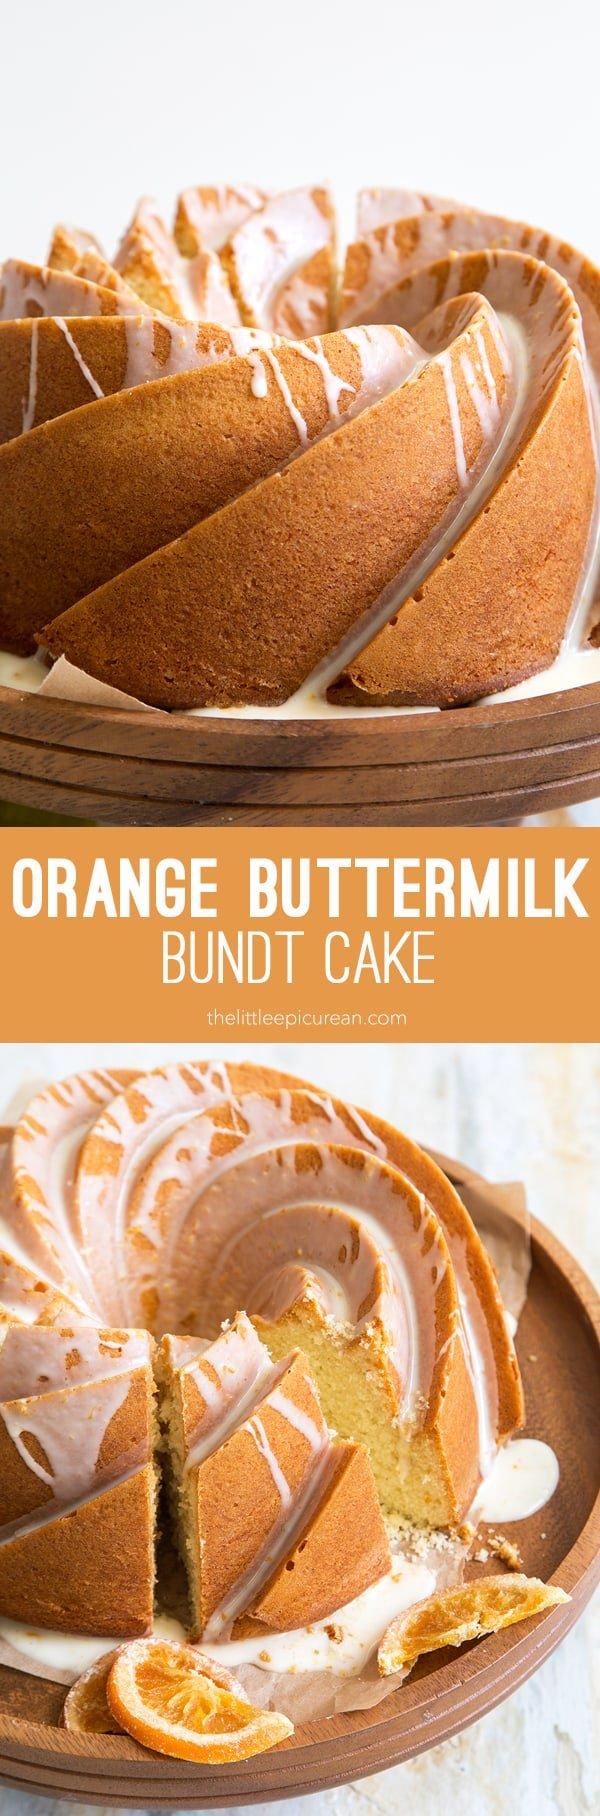 Orange Buttermilk Bundt Cake The Little Epicurean